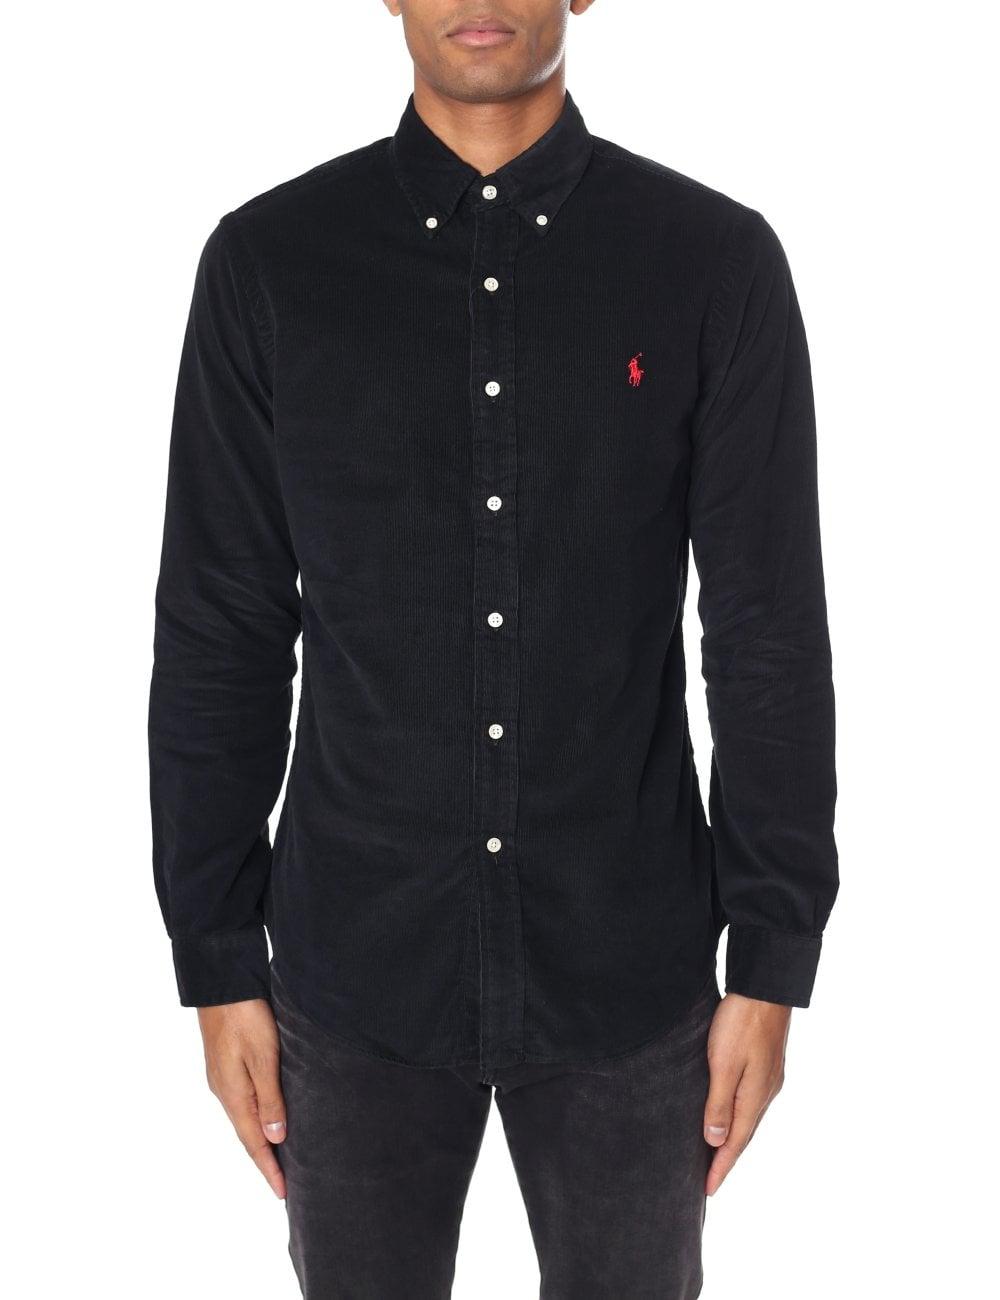 b9ae8a2ee0 Polo Ralph Lauren Men's Slim Fit Long Sleeve Shirt